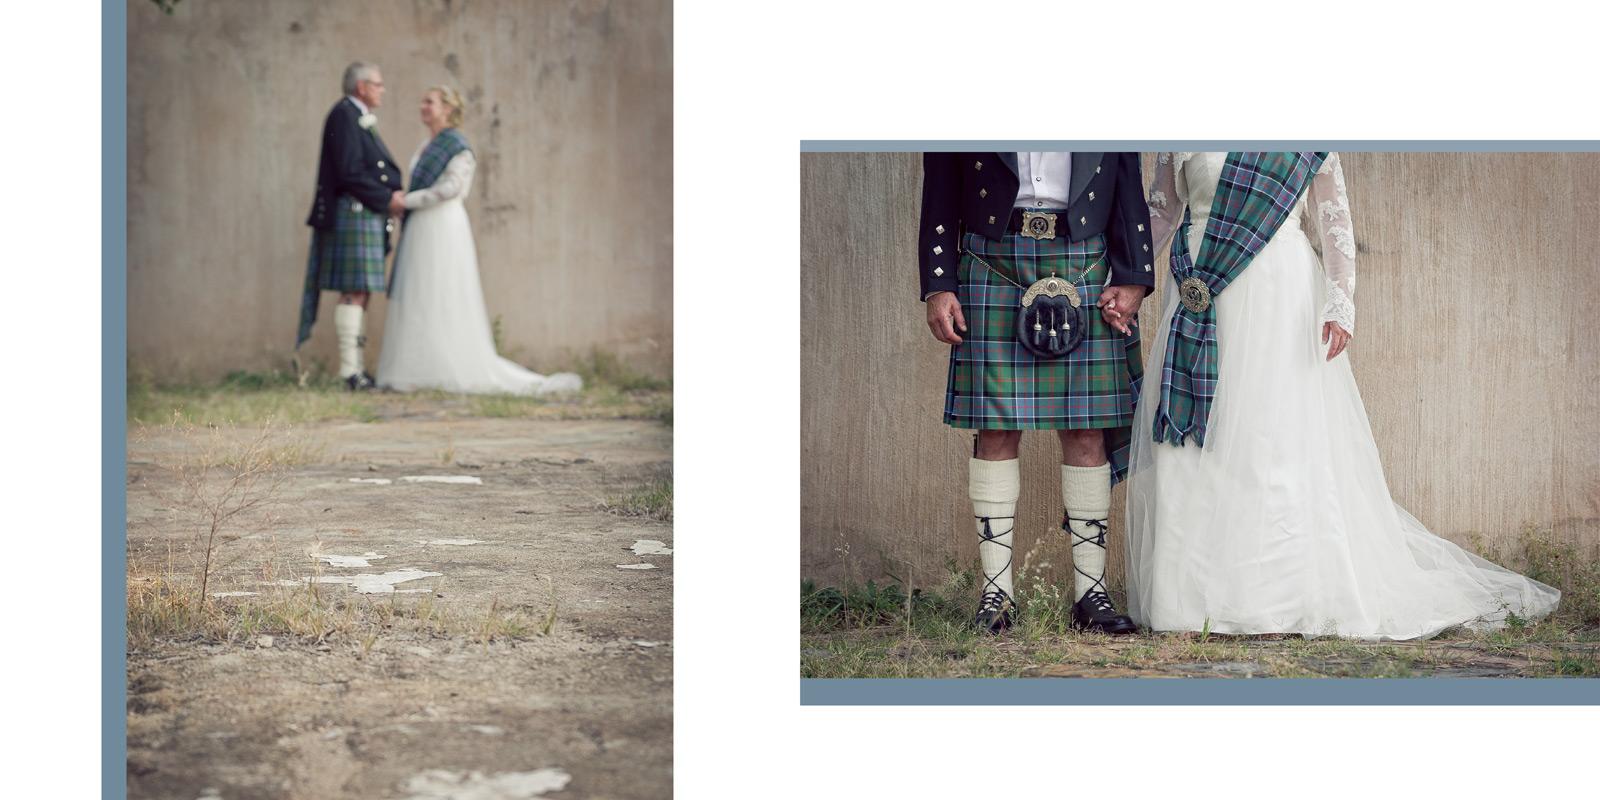 Nathalie Boucry Photography | Deidre and Lister Wedding Album 020